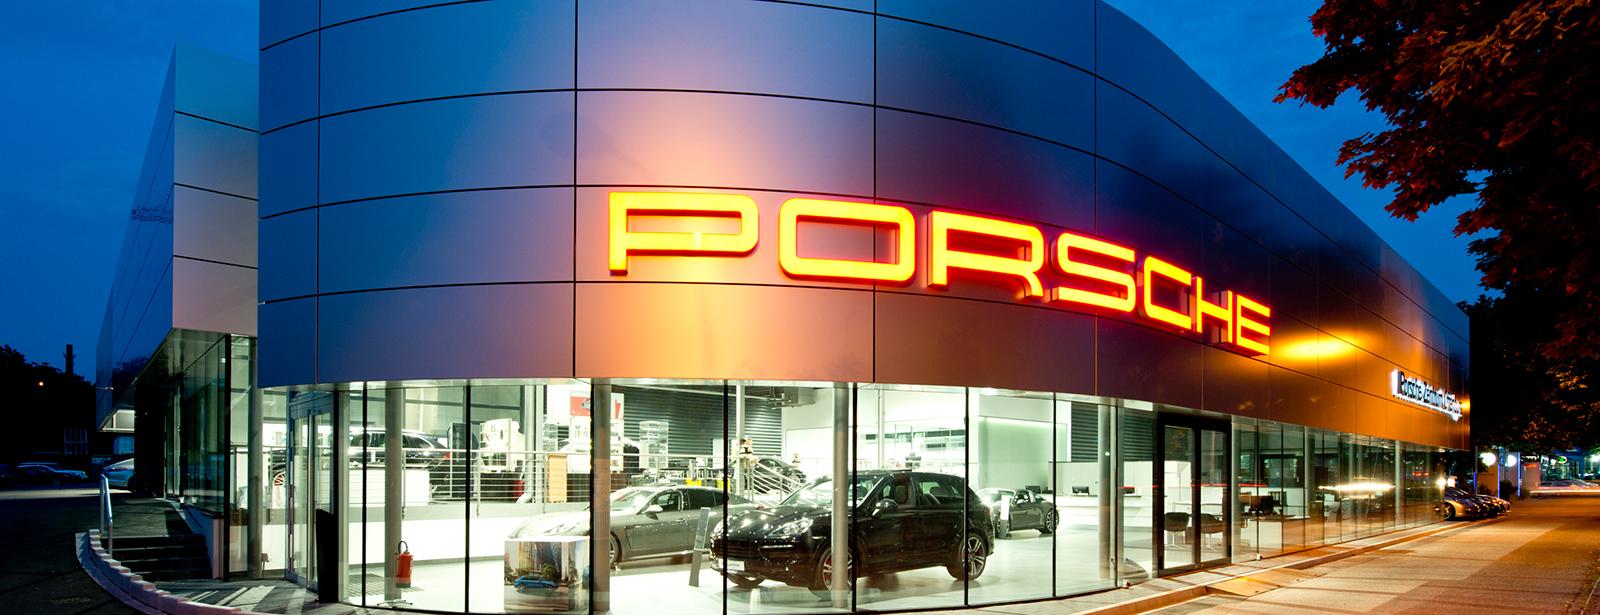 Le Centre Porsche de Offenburg